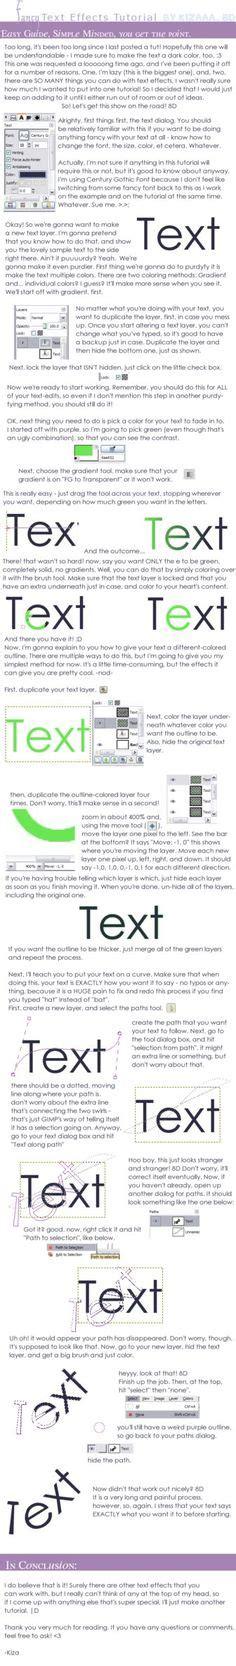 gimp tutorial text in a circle cool circle light effect in gimp gimp tutorials net